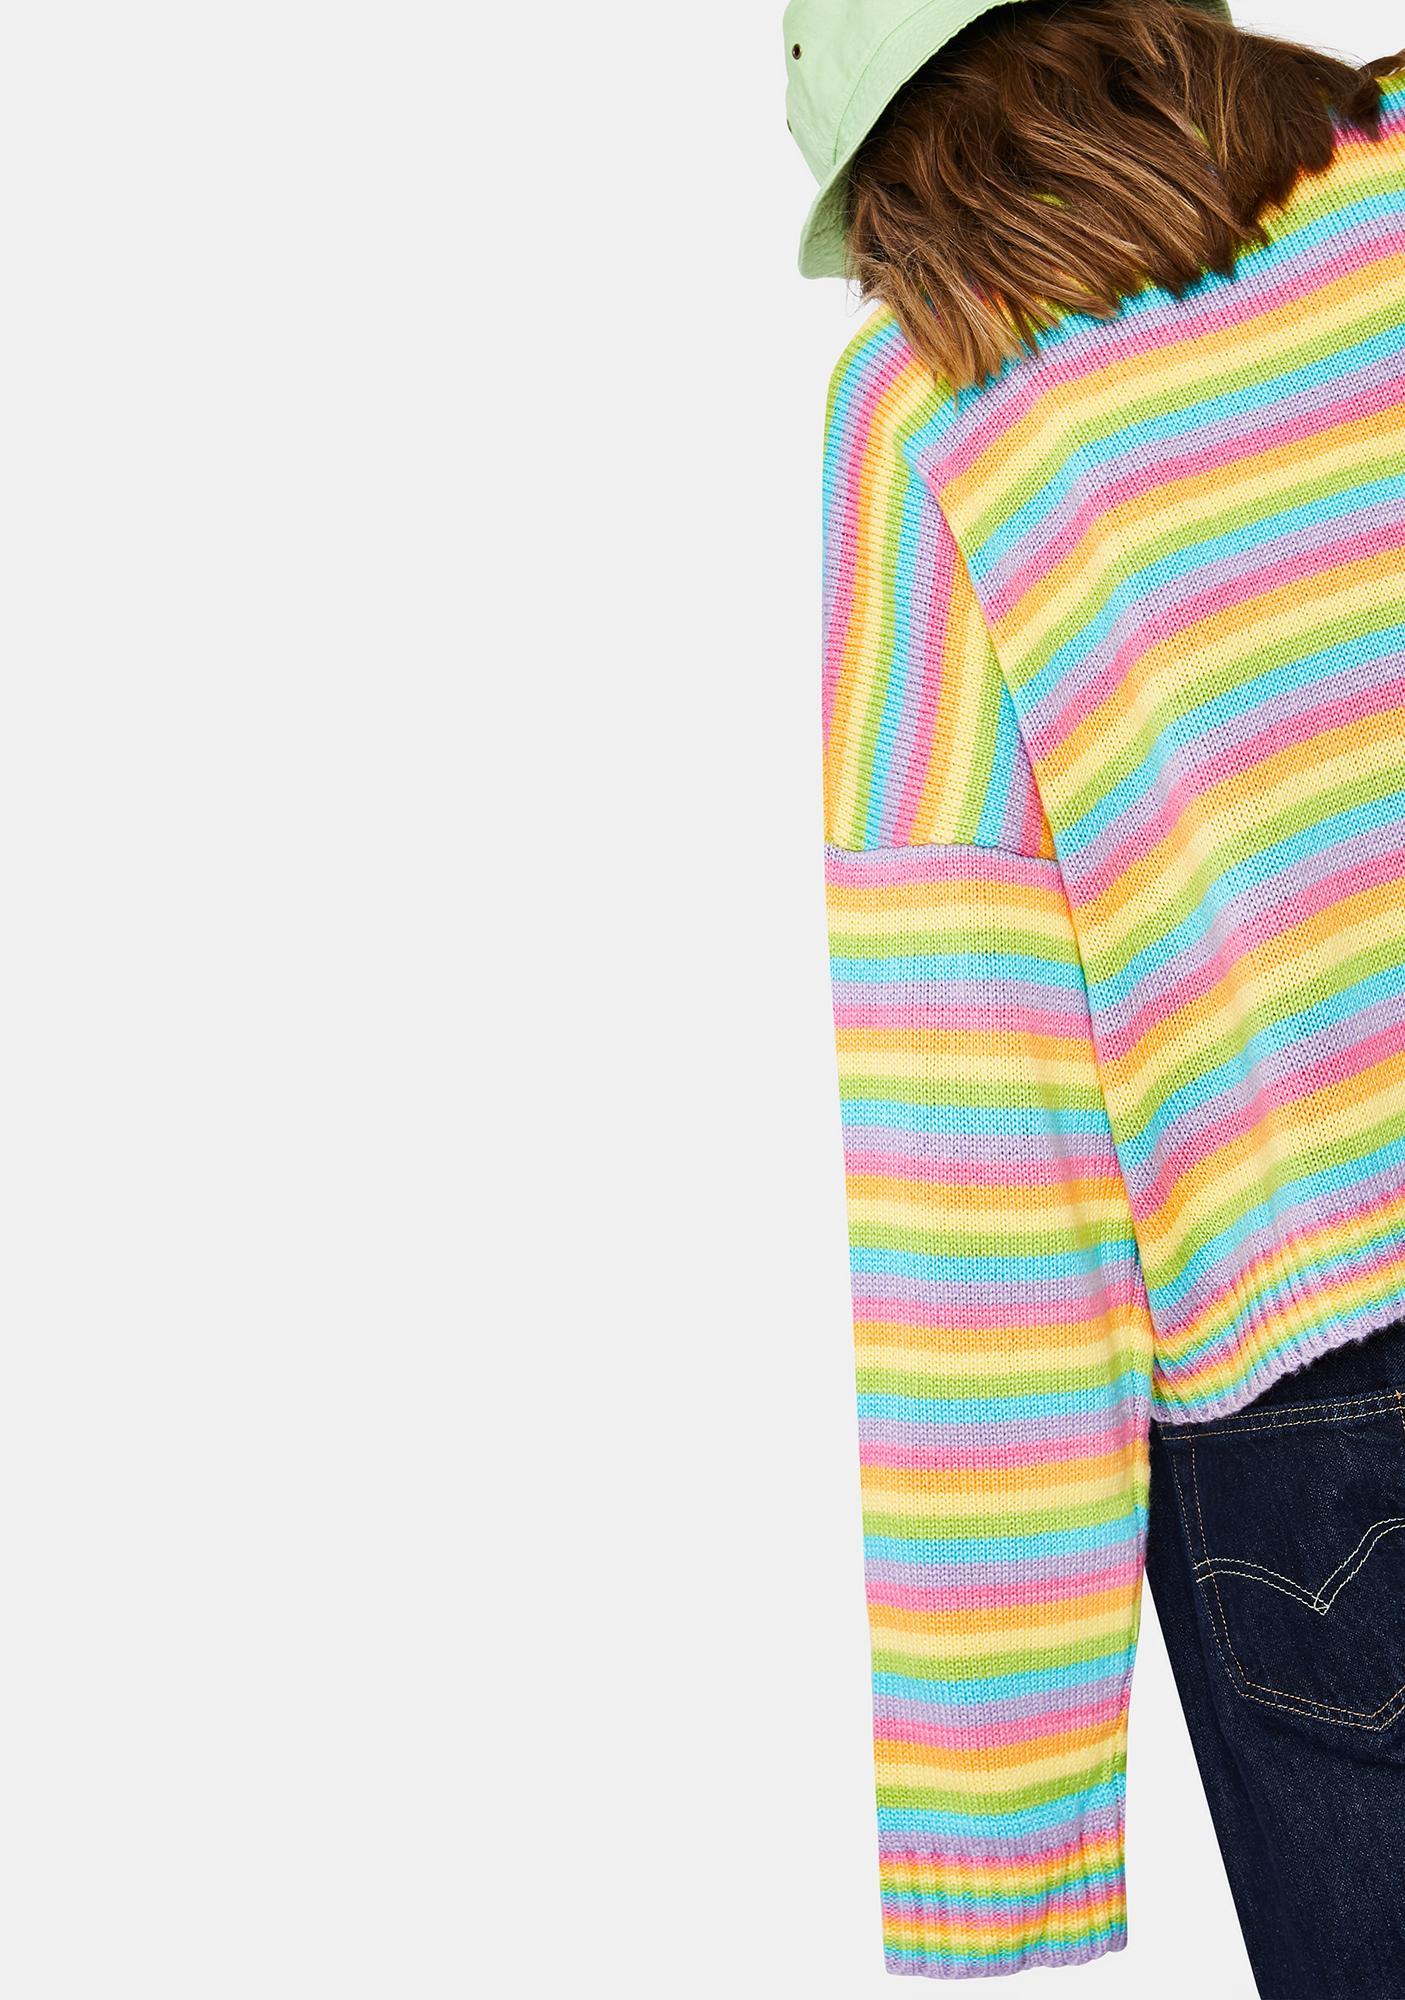 The Ragged Priest Glow Up Rainbow Knit Sweater